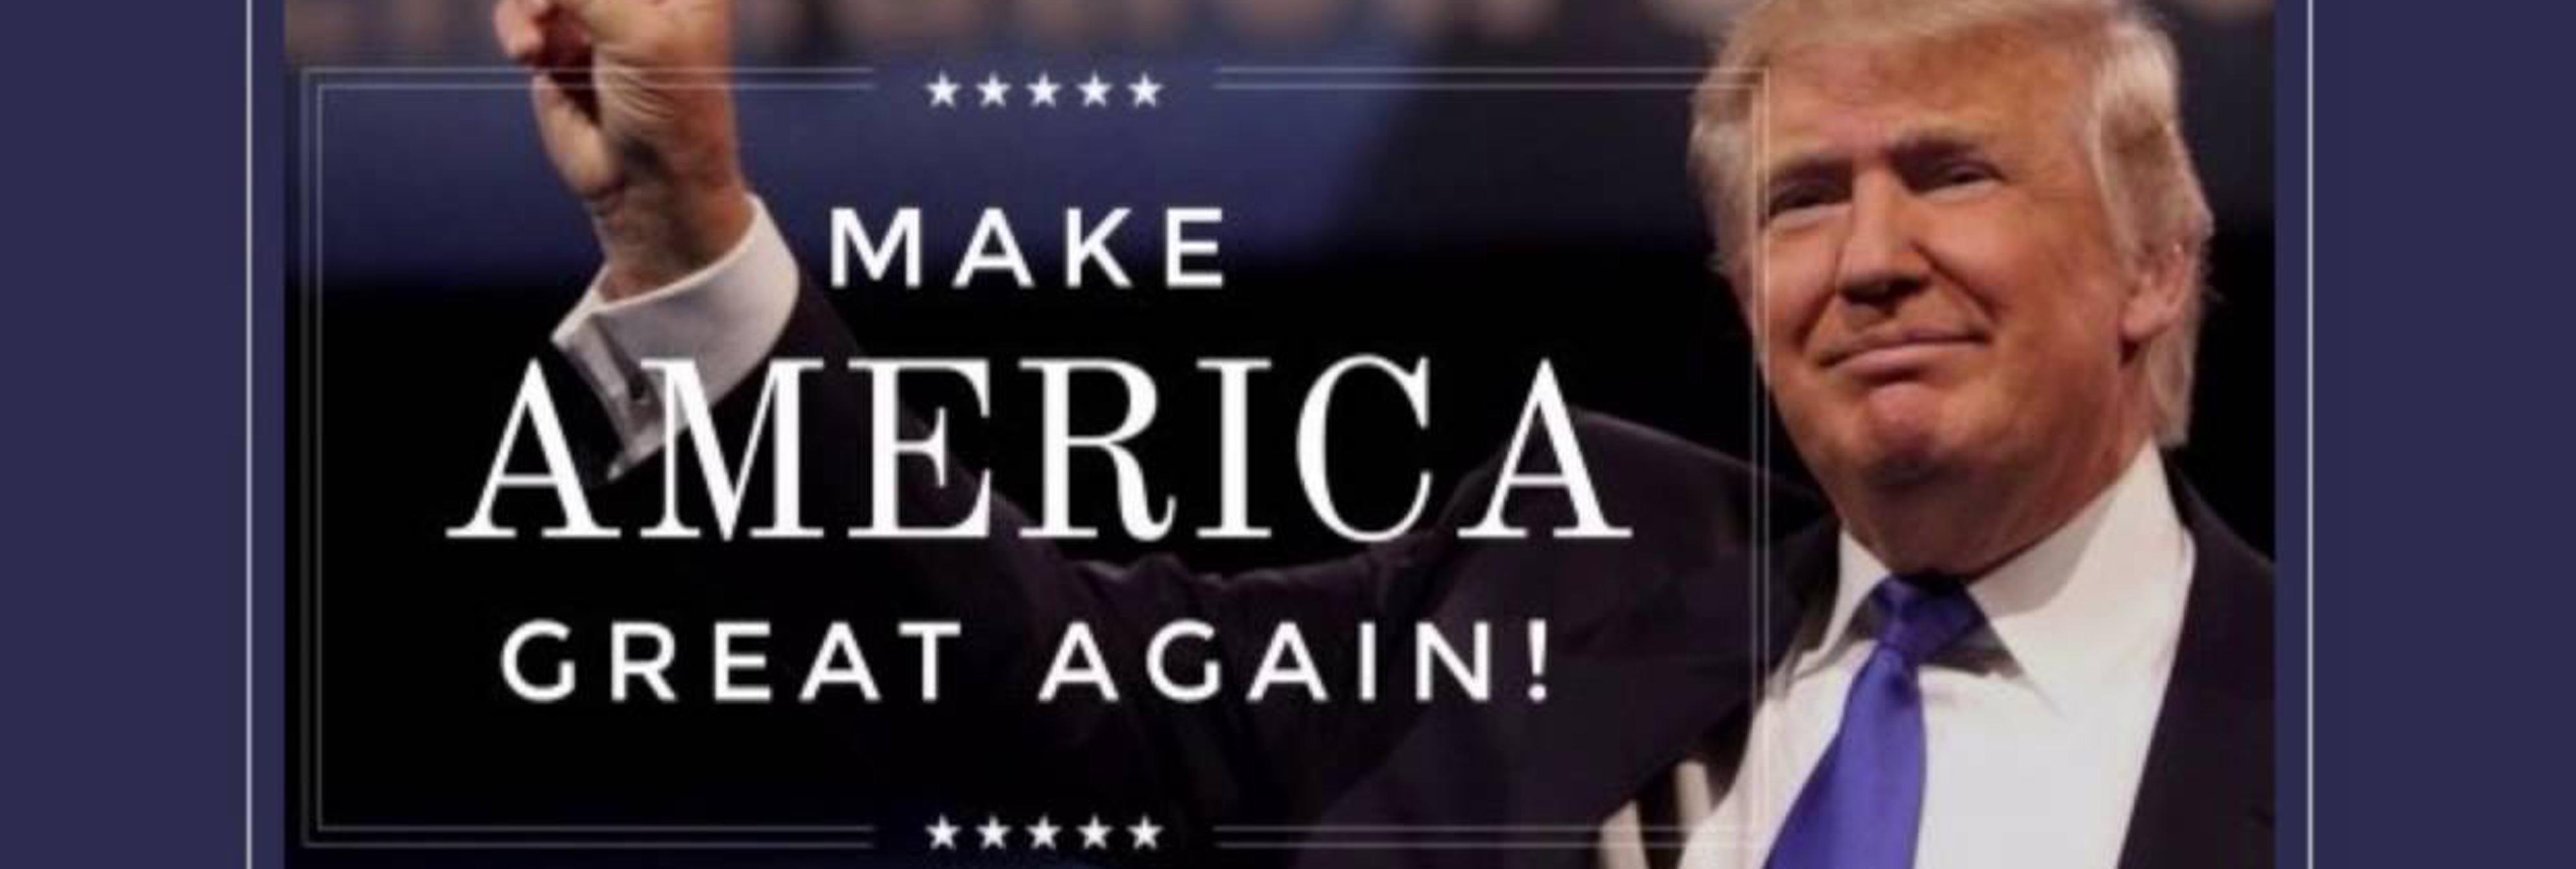 "Adolf Hitler prometió lo mismo que Donald Trump: ""Make Germany Great Again"""